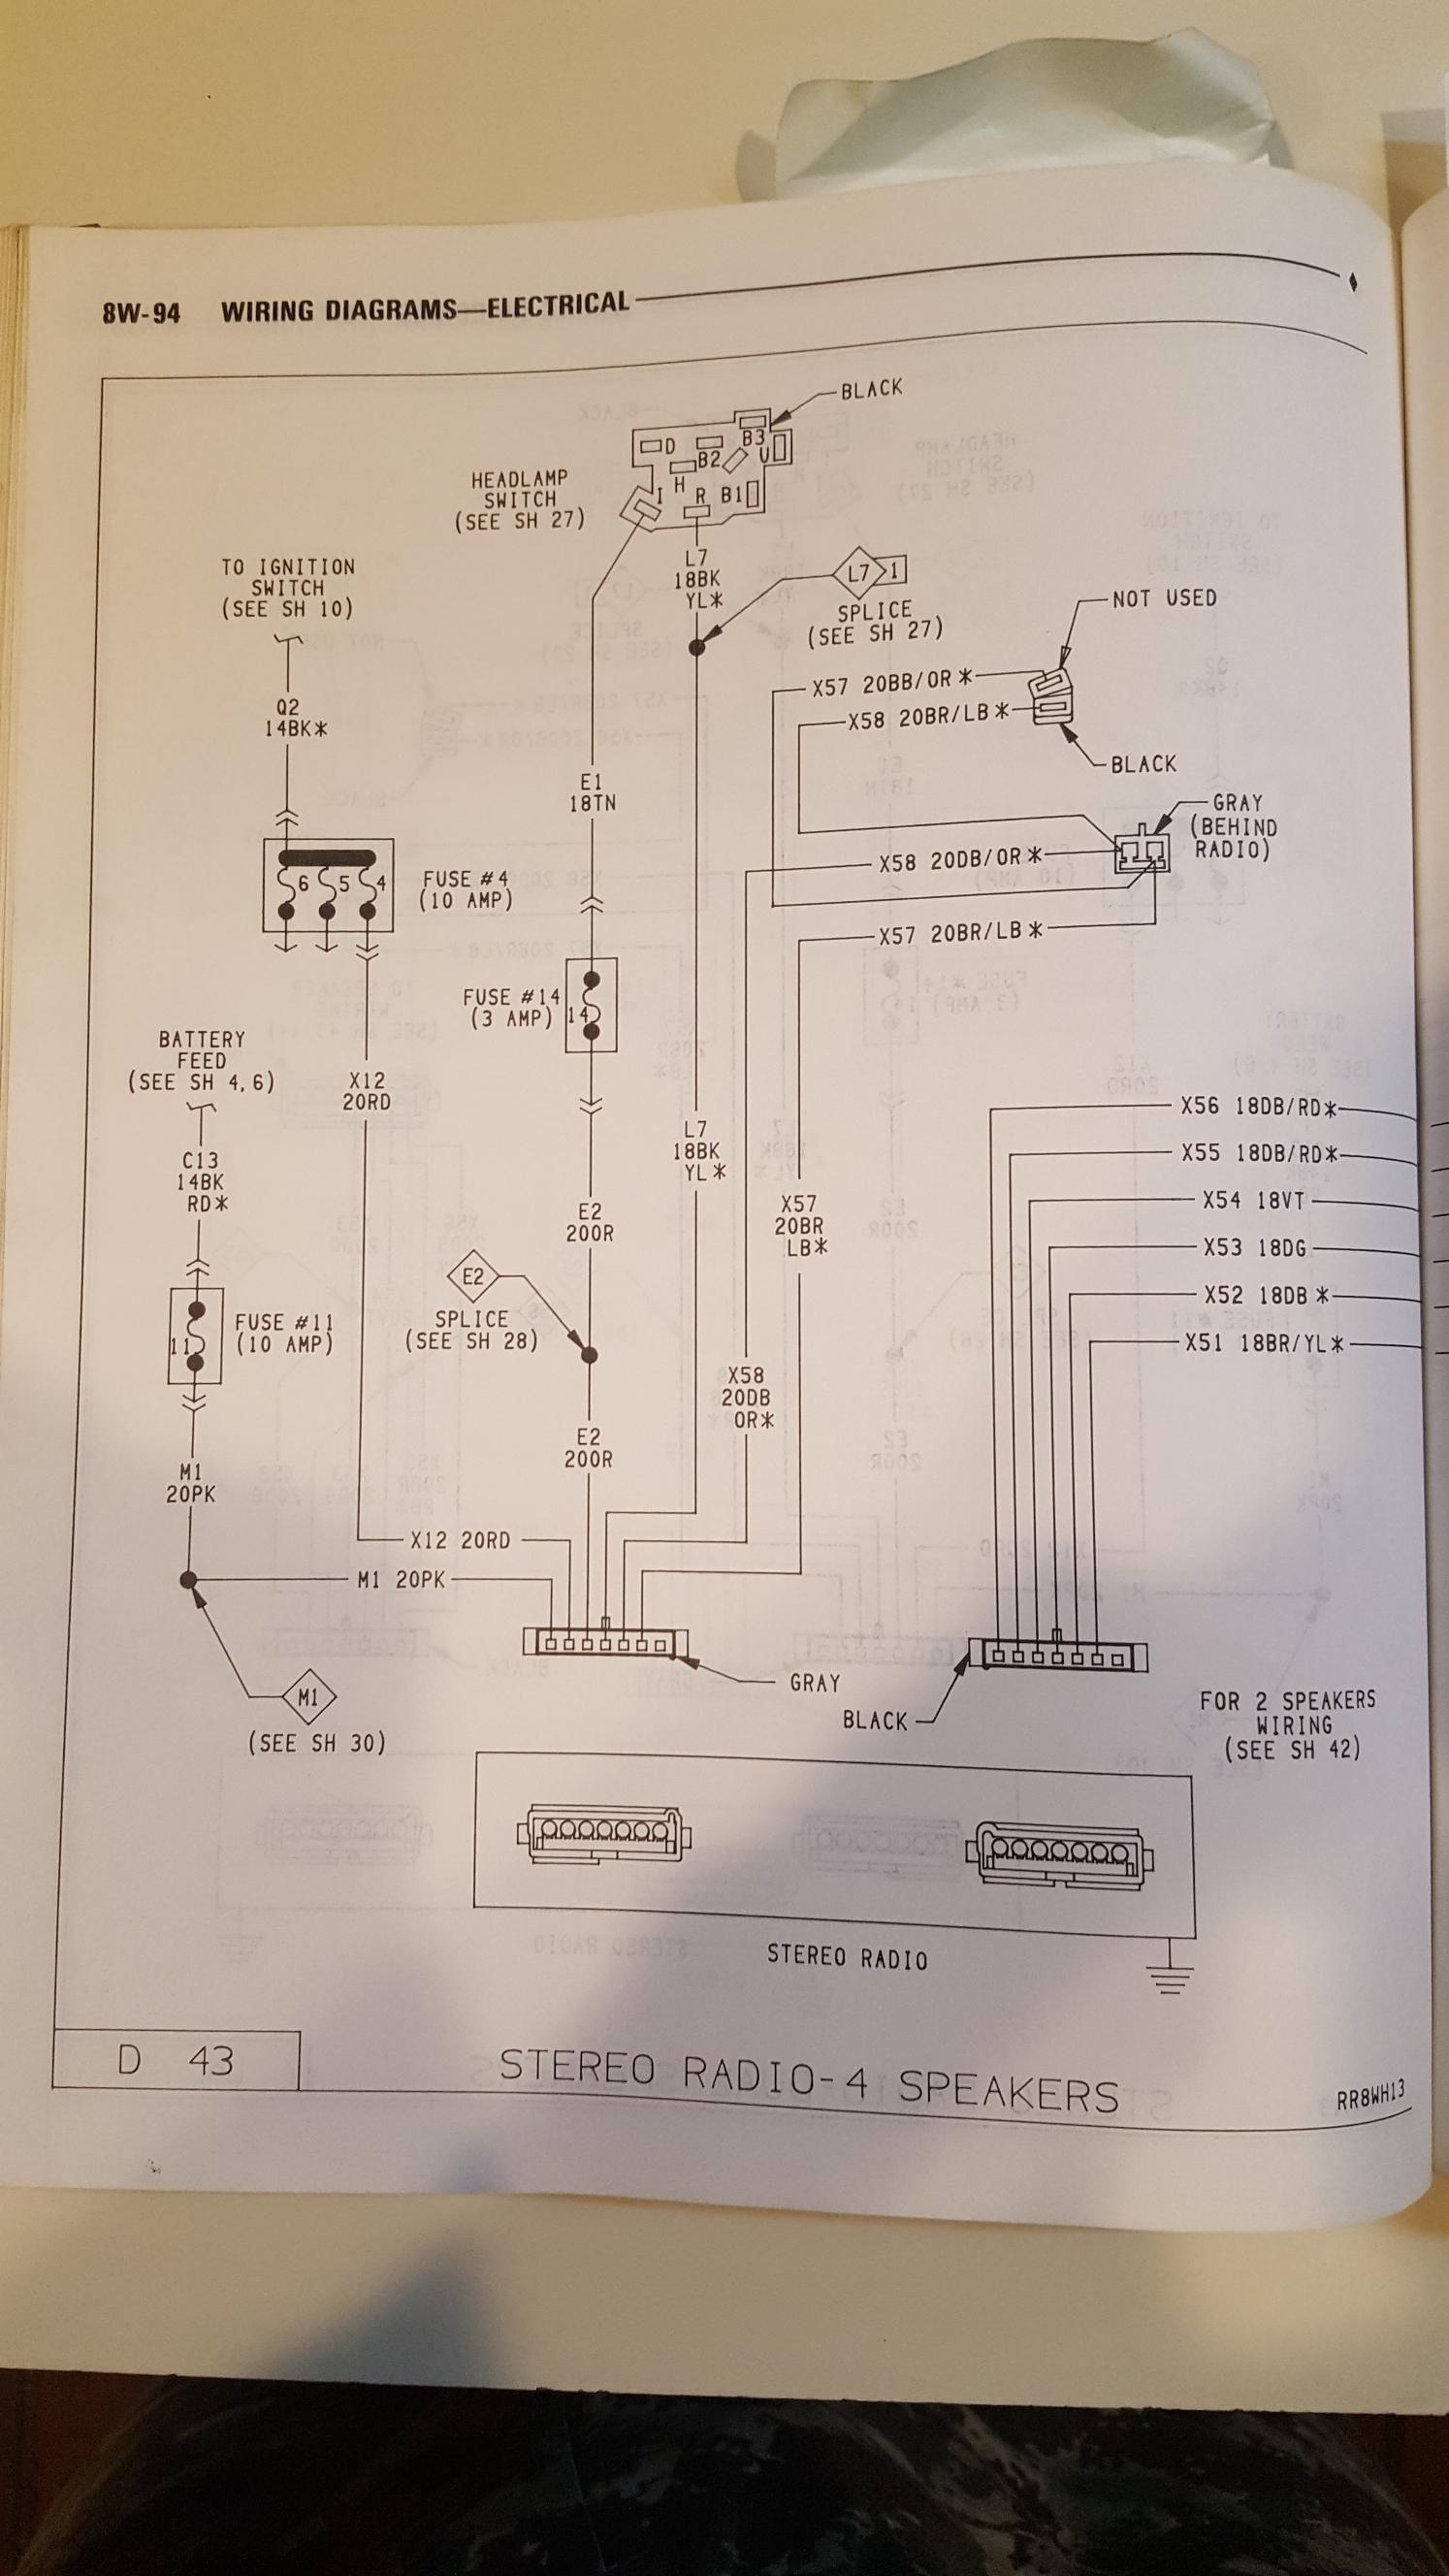 Stereo Wiring Diagram Help   Dodge Ram Cummins Diesels and MoparDodge Ram Cummins Diesels and Mopar